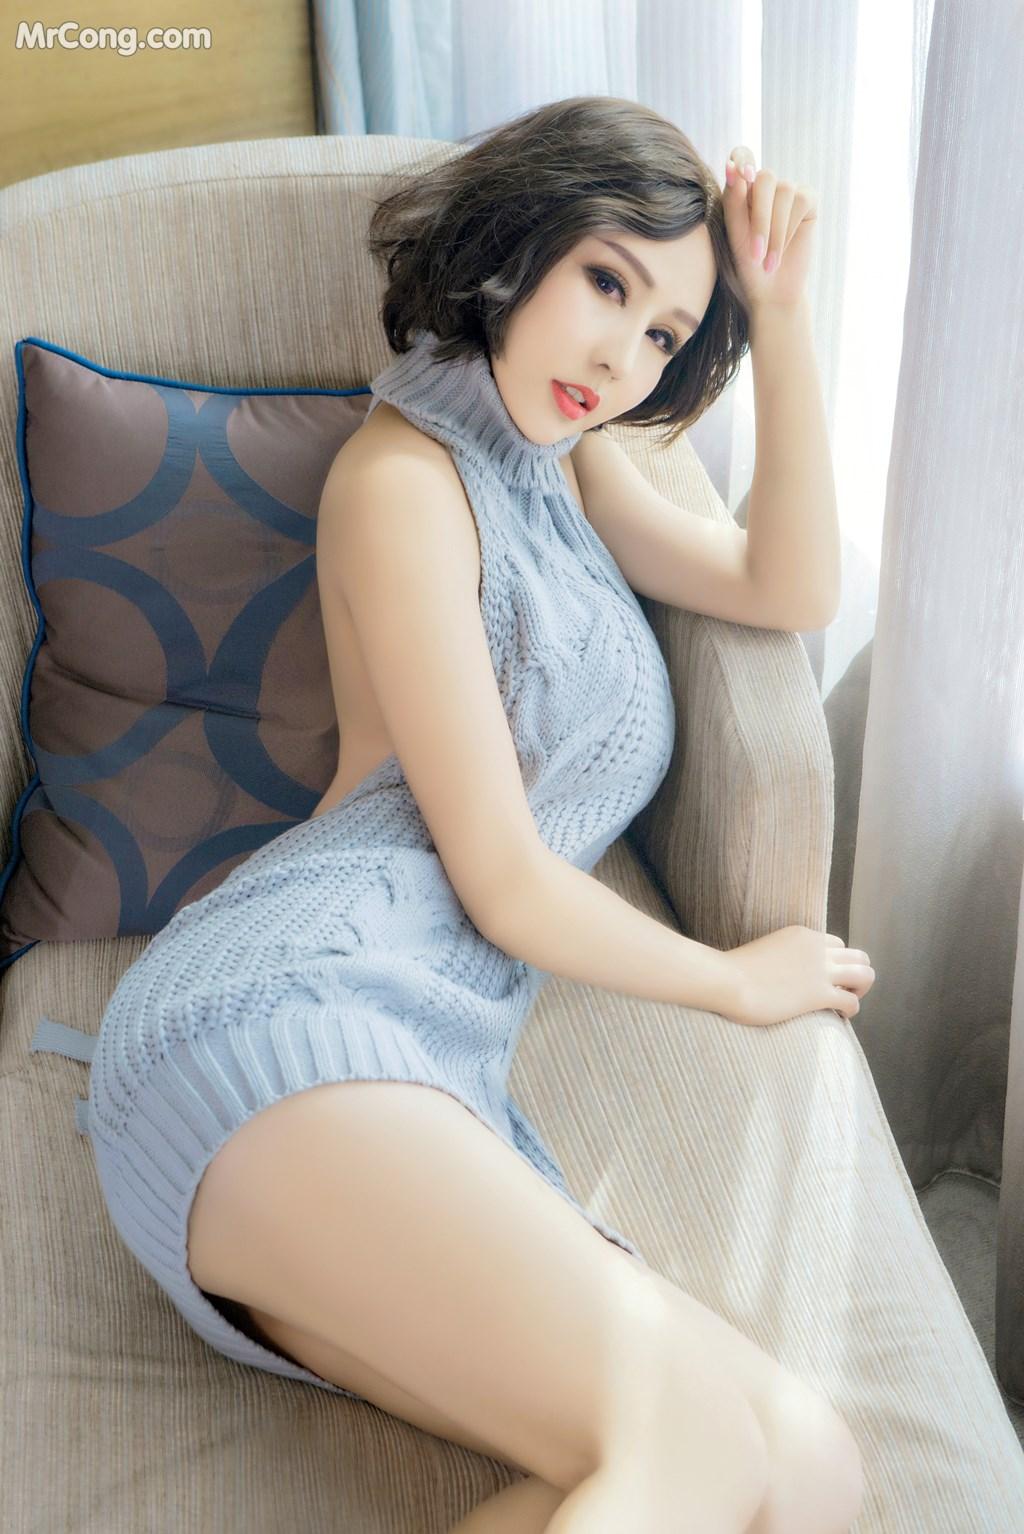 Image SLADY-2017-05-27-No.011-Na-Yi-Ling-Er-MrCong.com-004 in post SLADY 2017-05-27 No.011: Người mẫu Na Yi Ling Er (娜依灵儿) (54 ảnh)